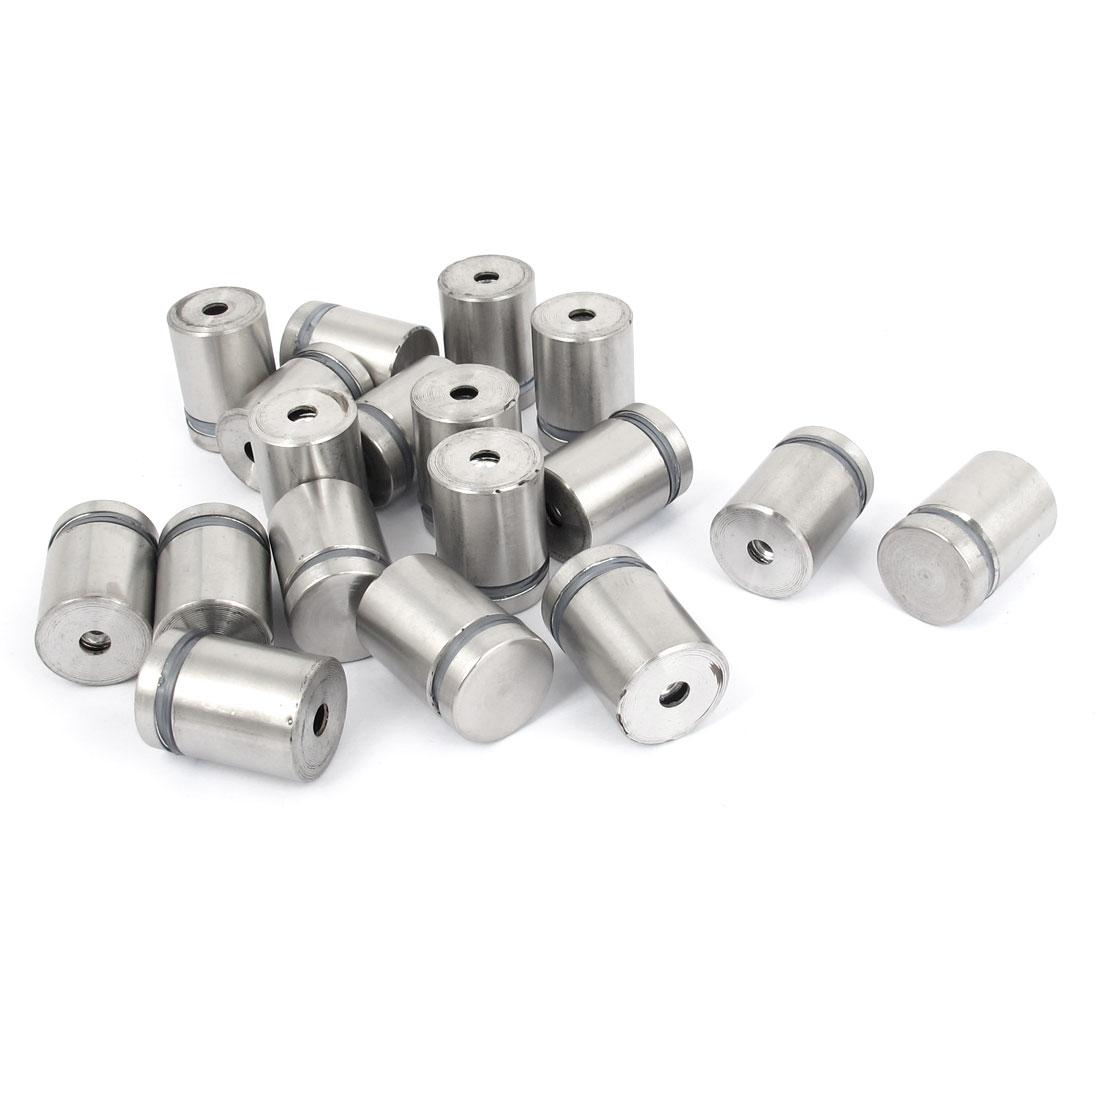 19mm x 25mm Stainless Steel Advertising Frameless Glass Standoff Pins 18pcs